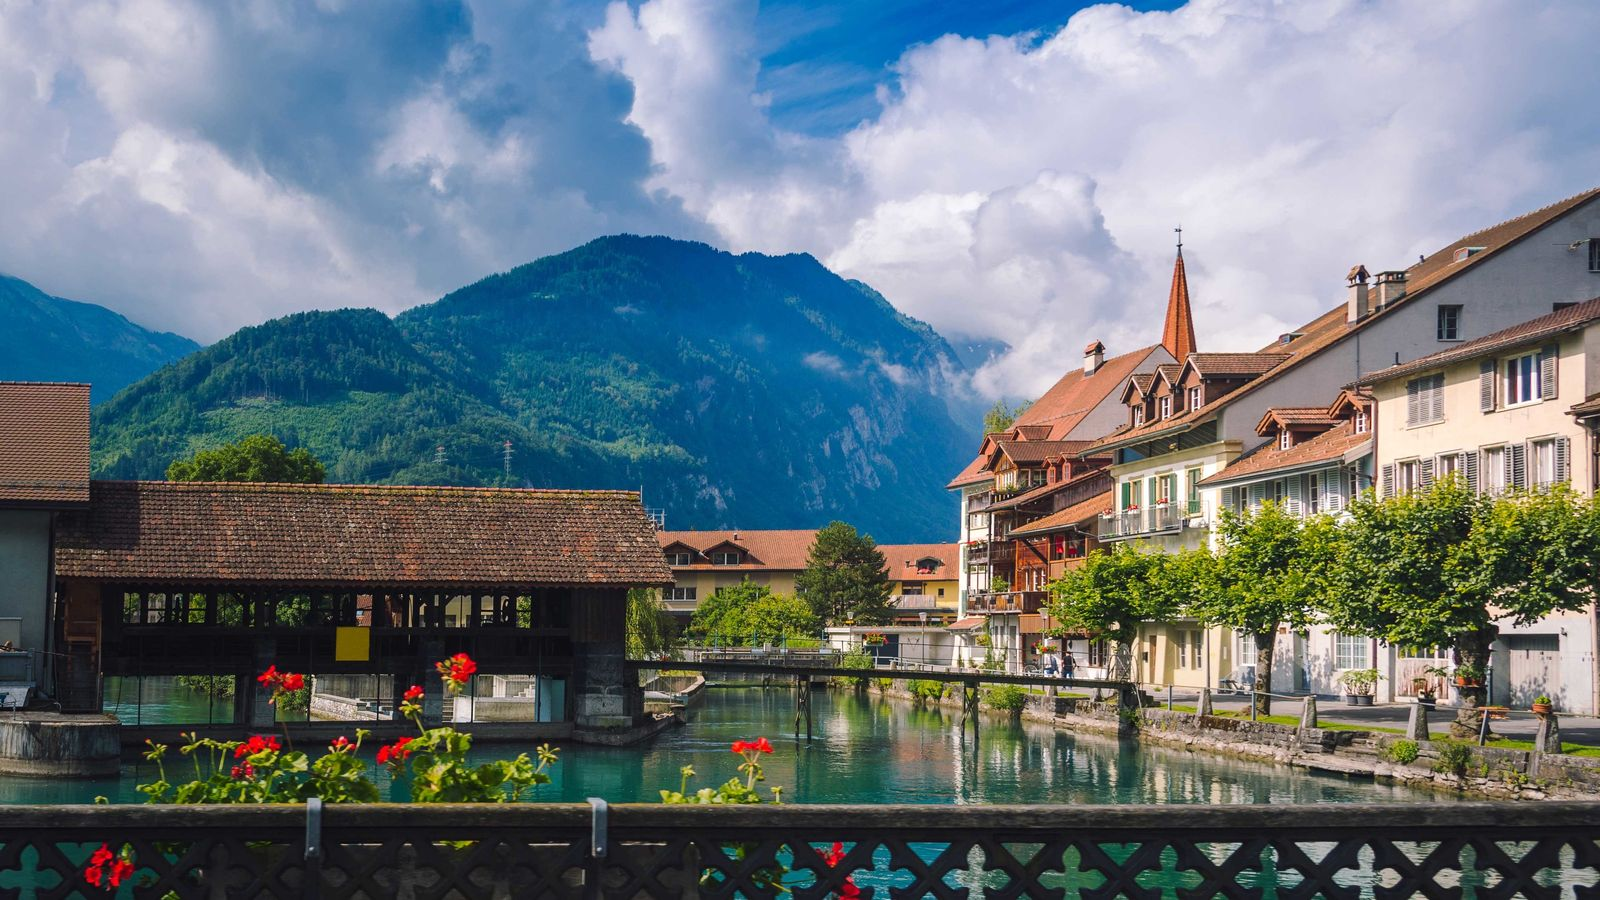 Interlaken is a resort town in the Bernese Oberland region of central Switzerland.